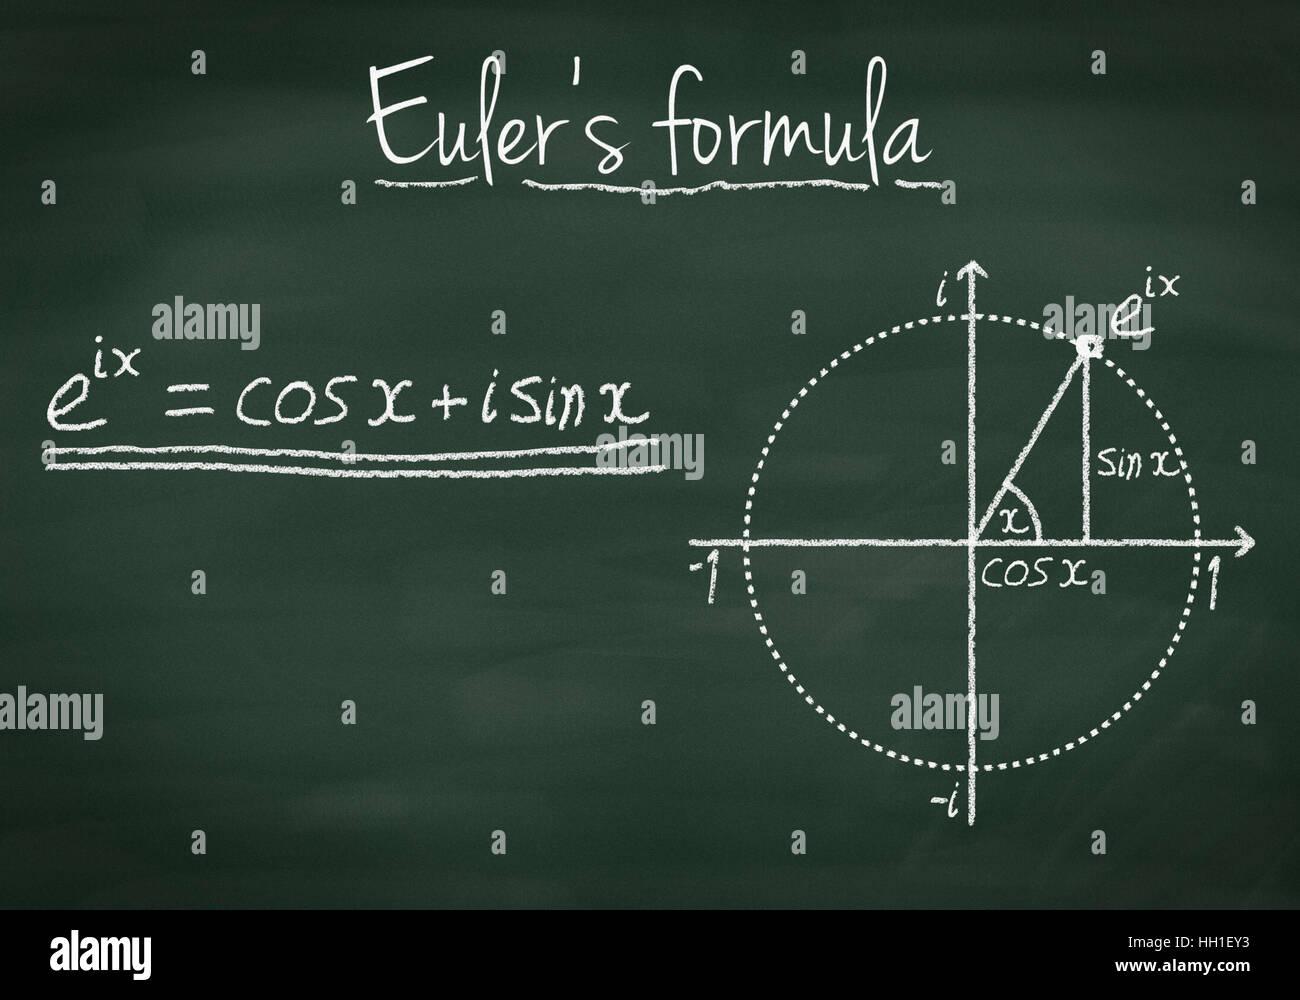 Euler's formula explained on a chalkboard - Stock Image